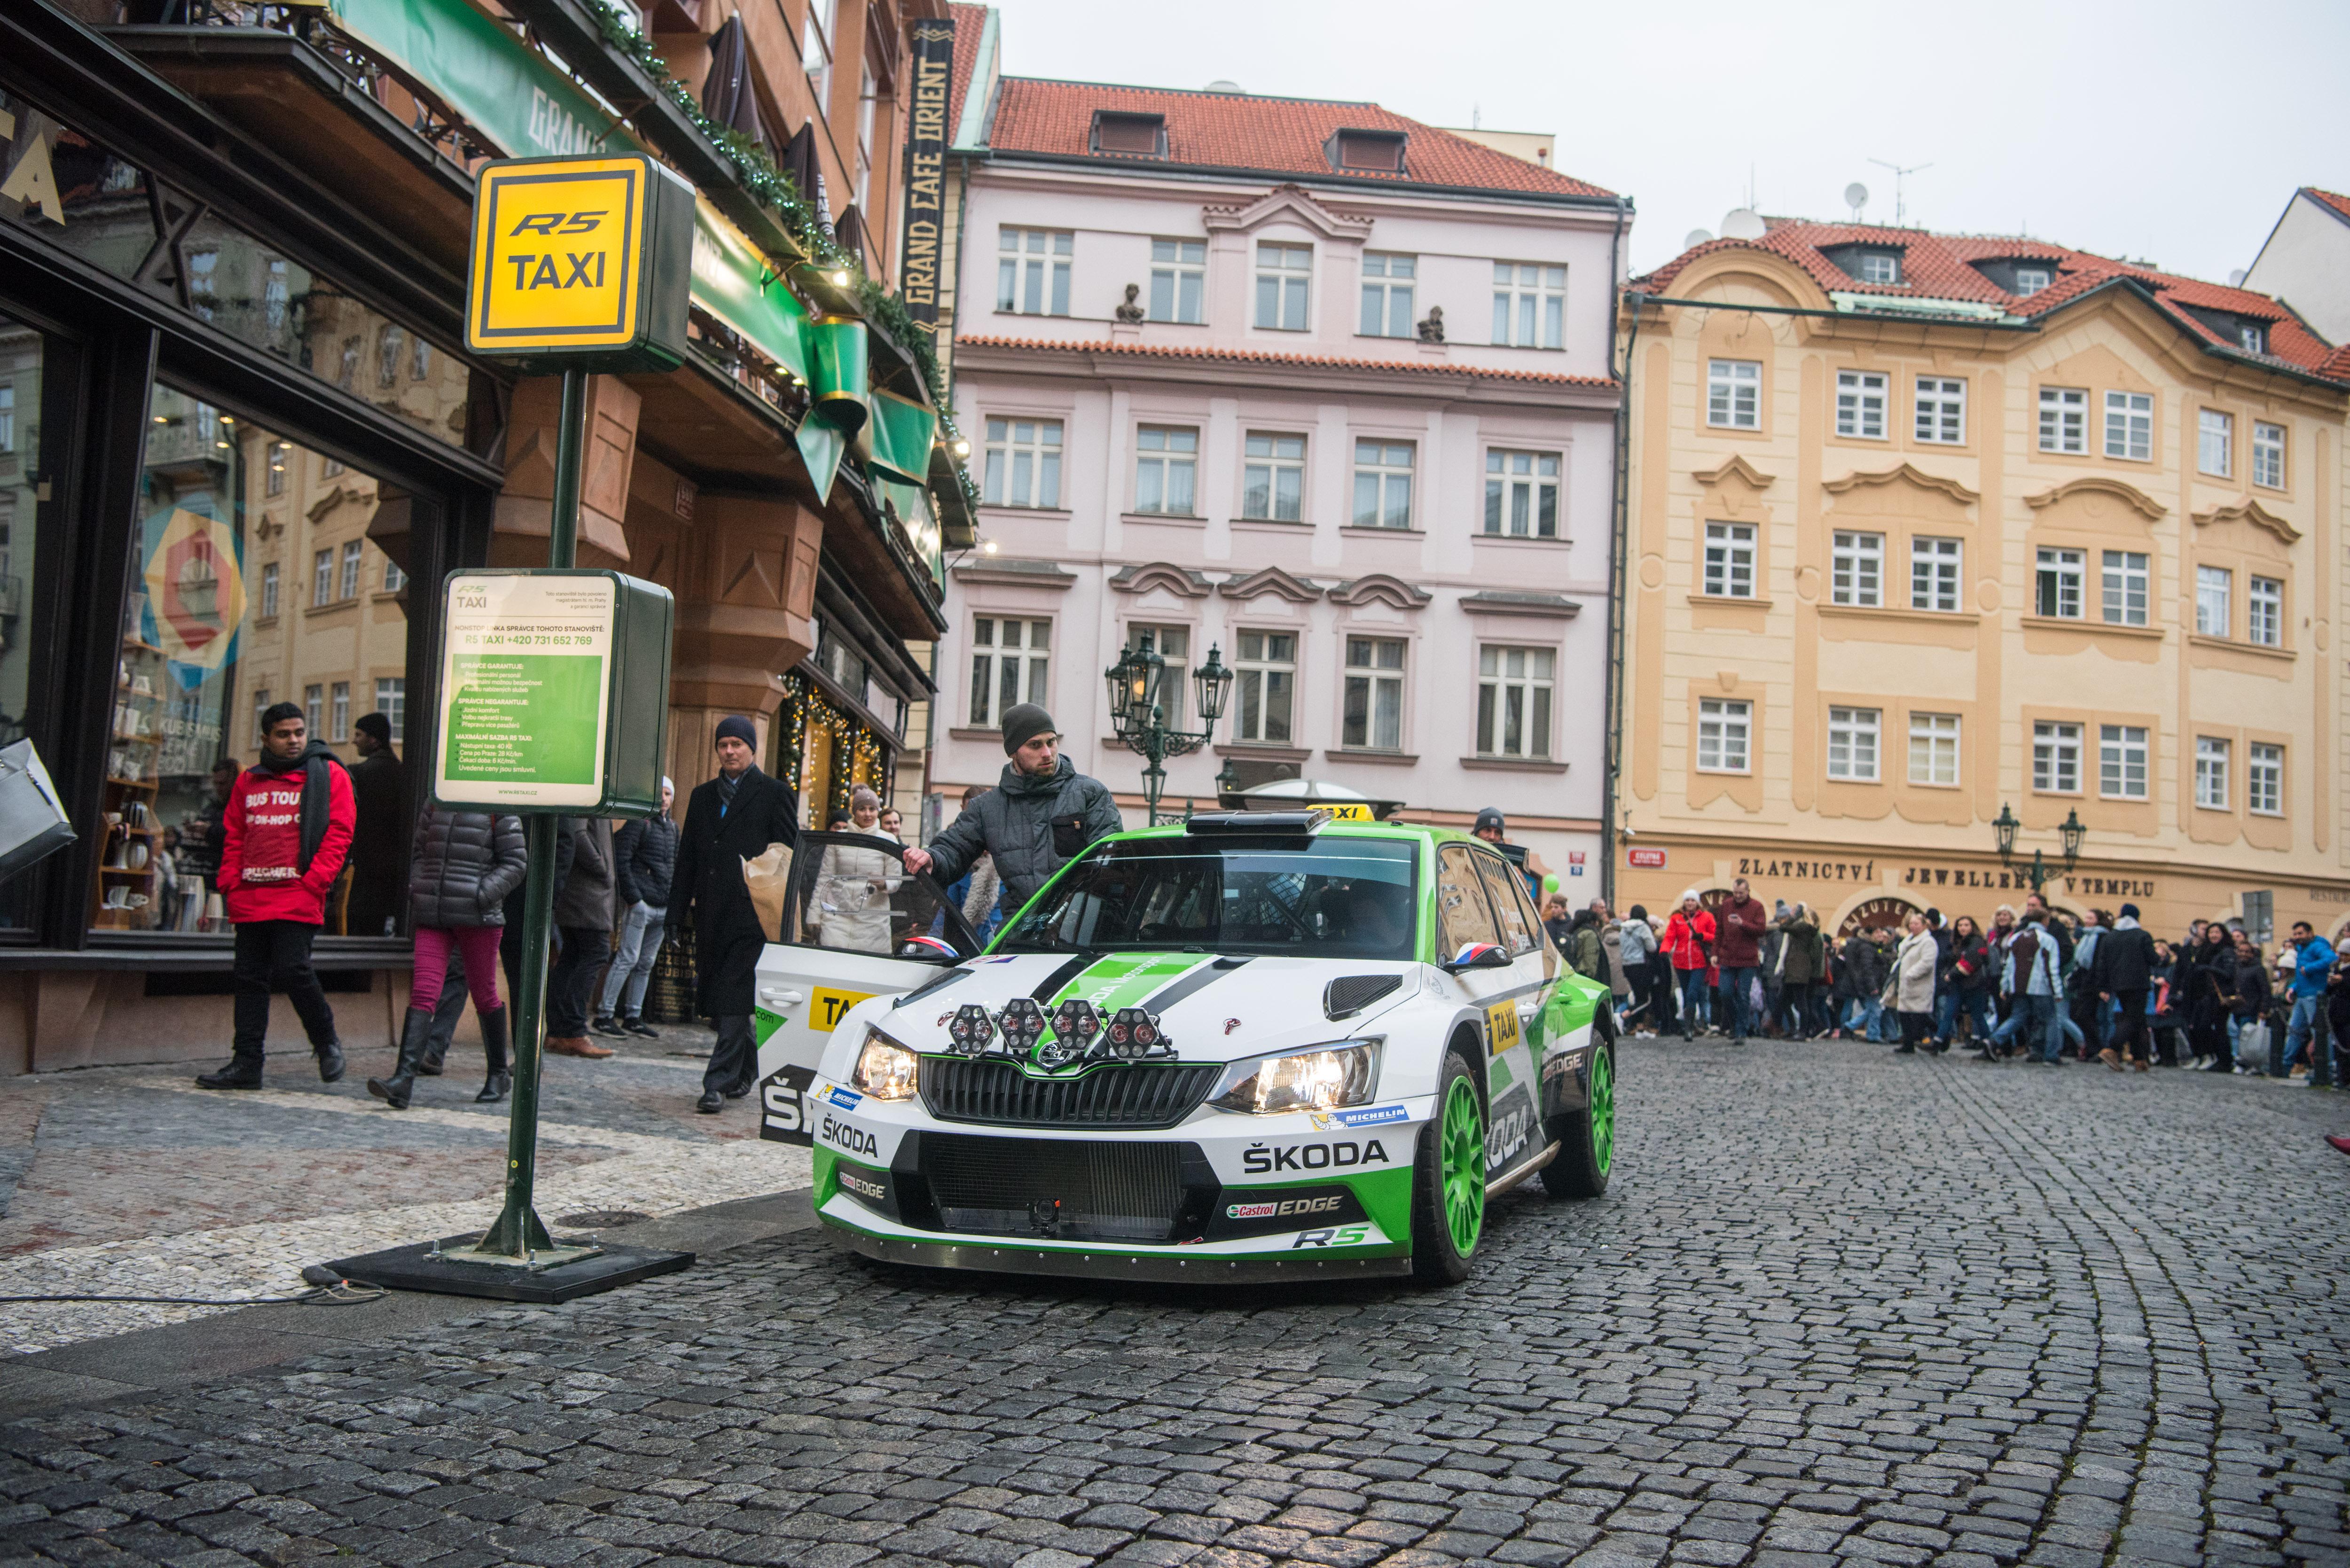 Taxi Taxi The Zesty Fabia R5 Raced Passengers Through Prague